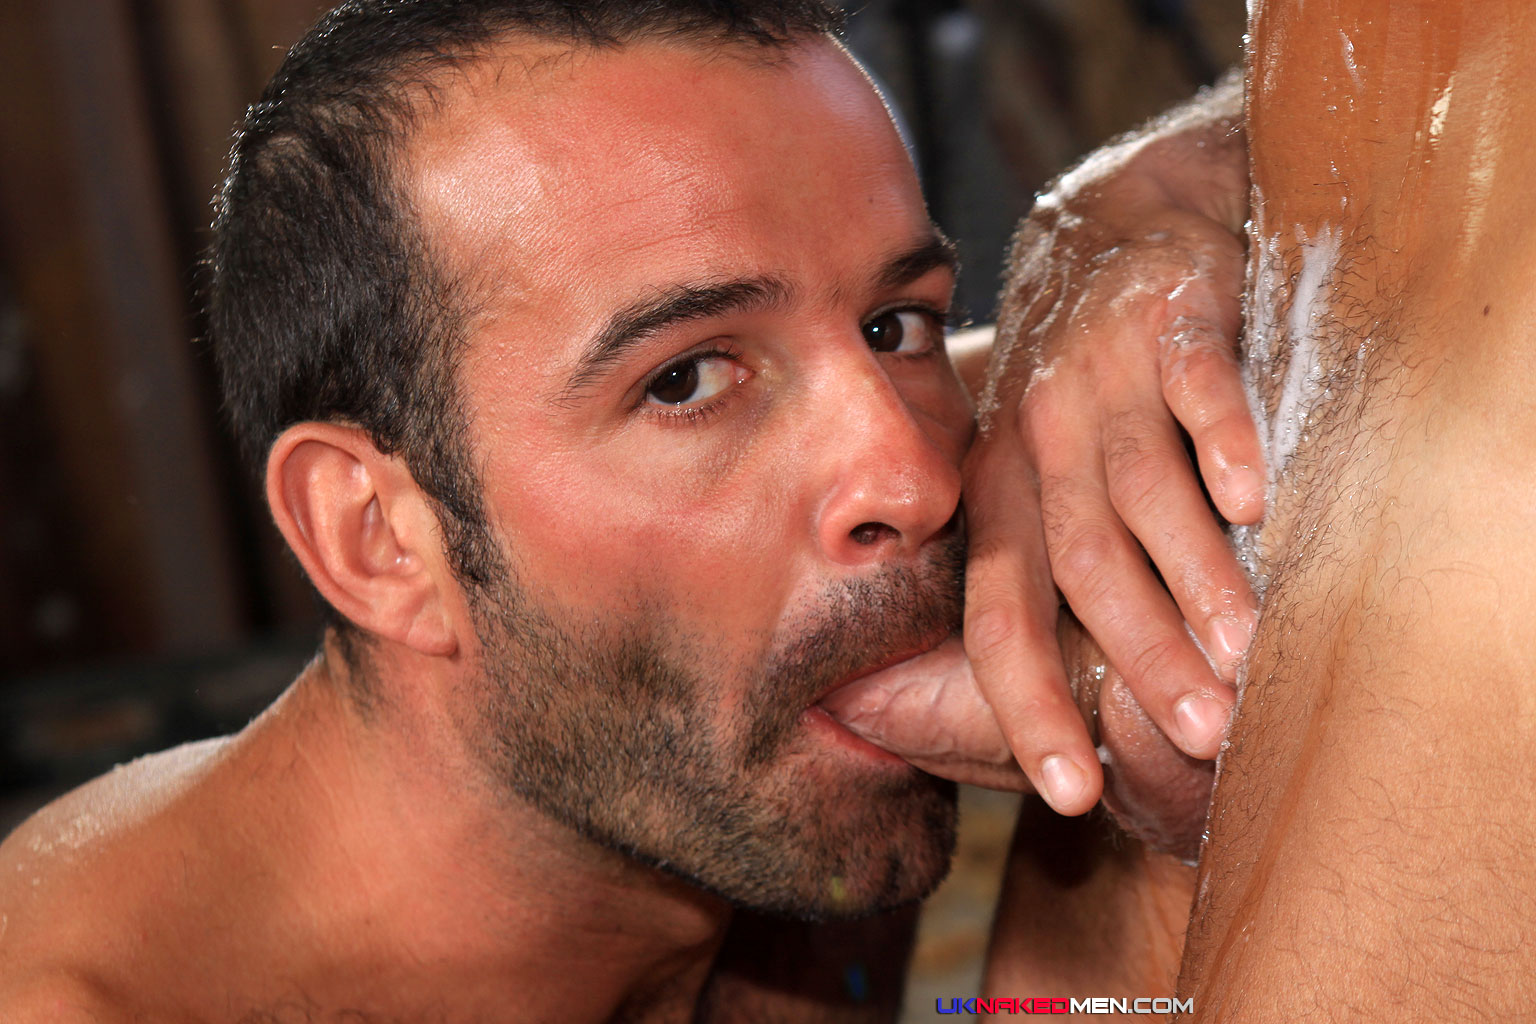 Gay porn gallery: UK Naked Men